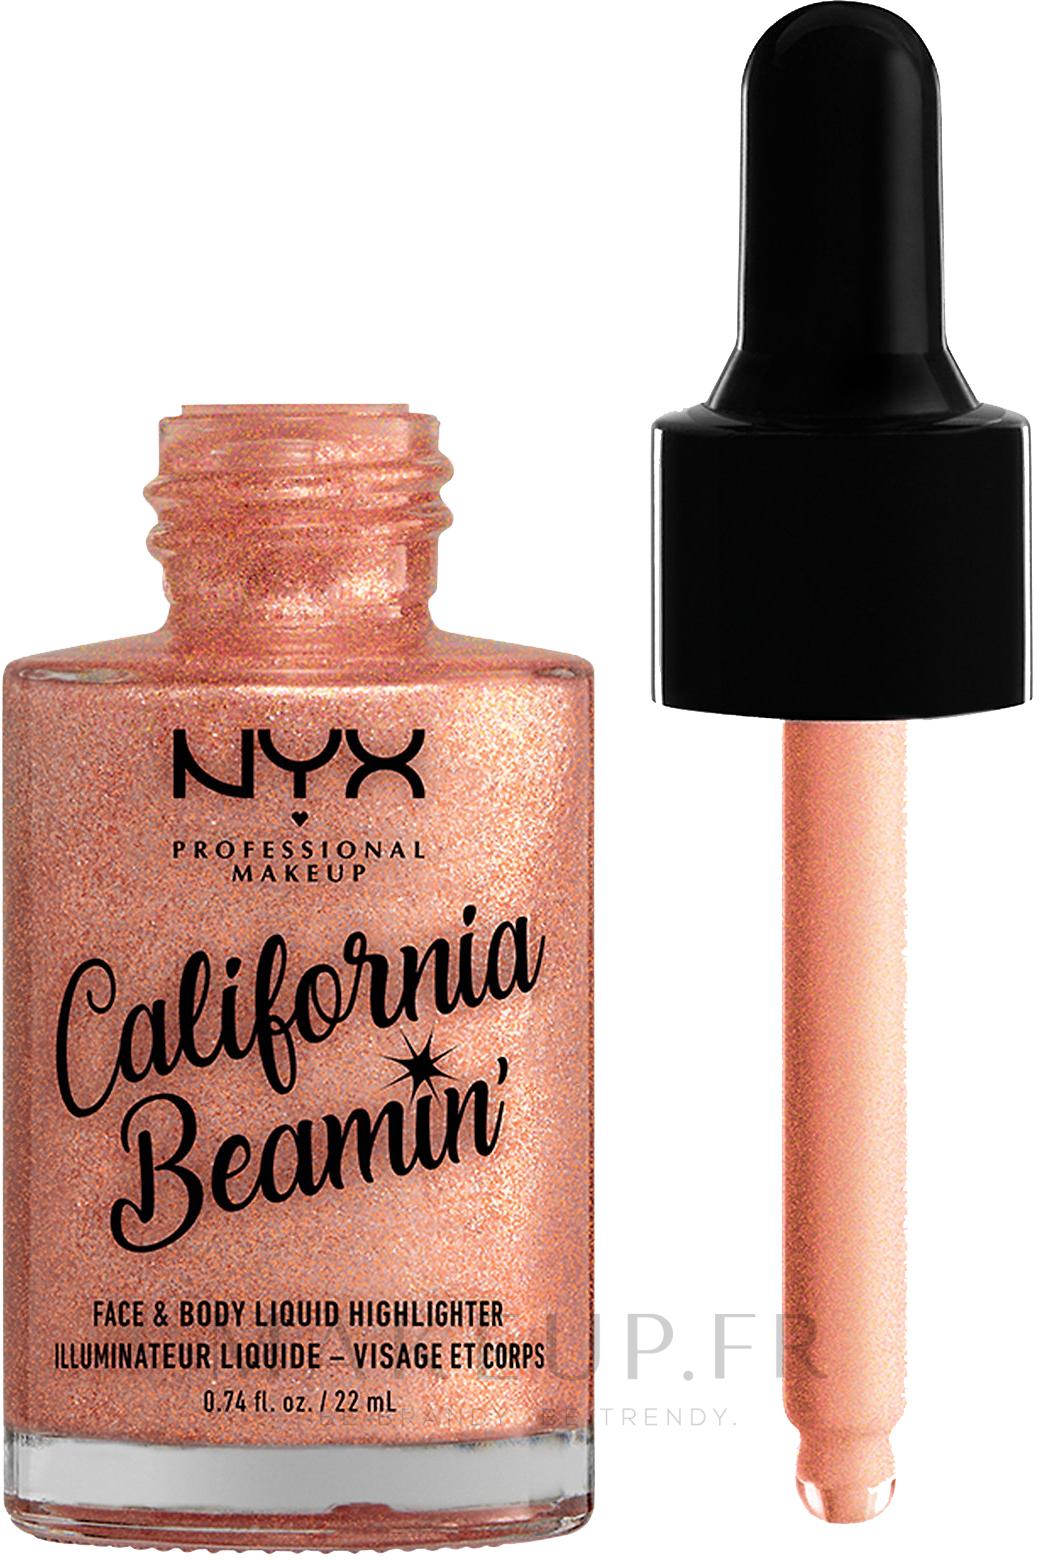 Enlumineur liquide visage et corps - NYX Professional Makeup California Beamin' Face & Body Liquid Highlighter — Photo Beach Baby